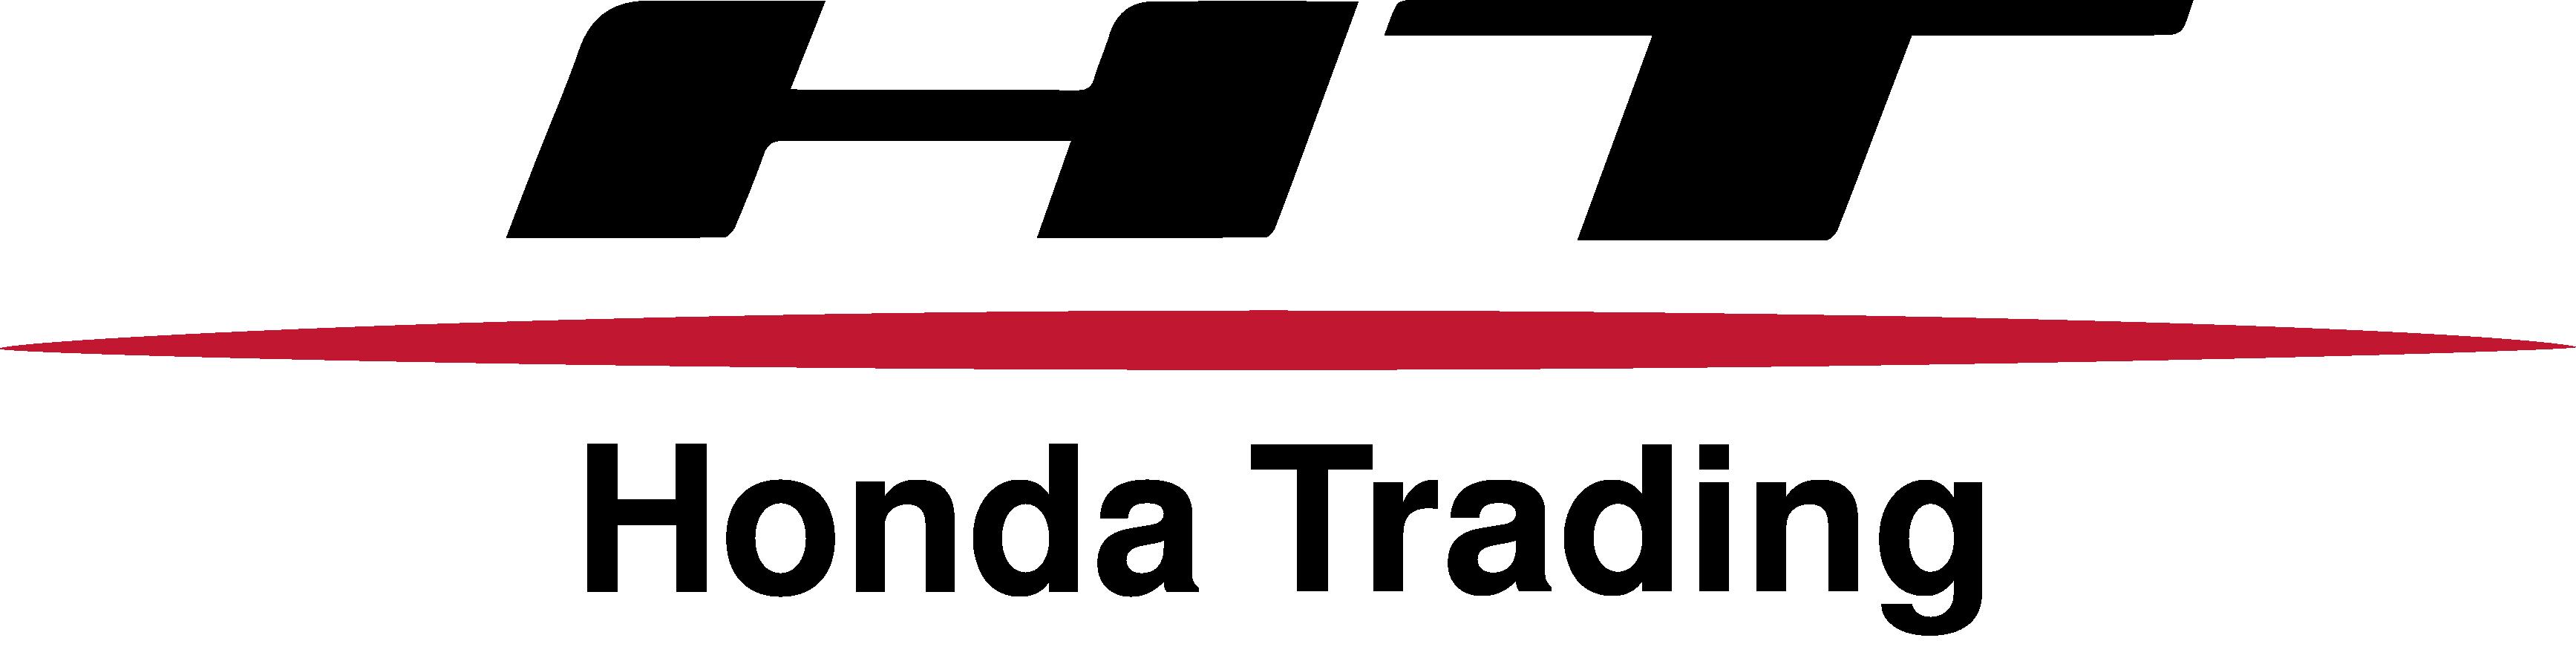 Honda Trading logo